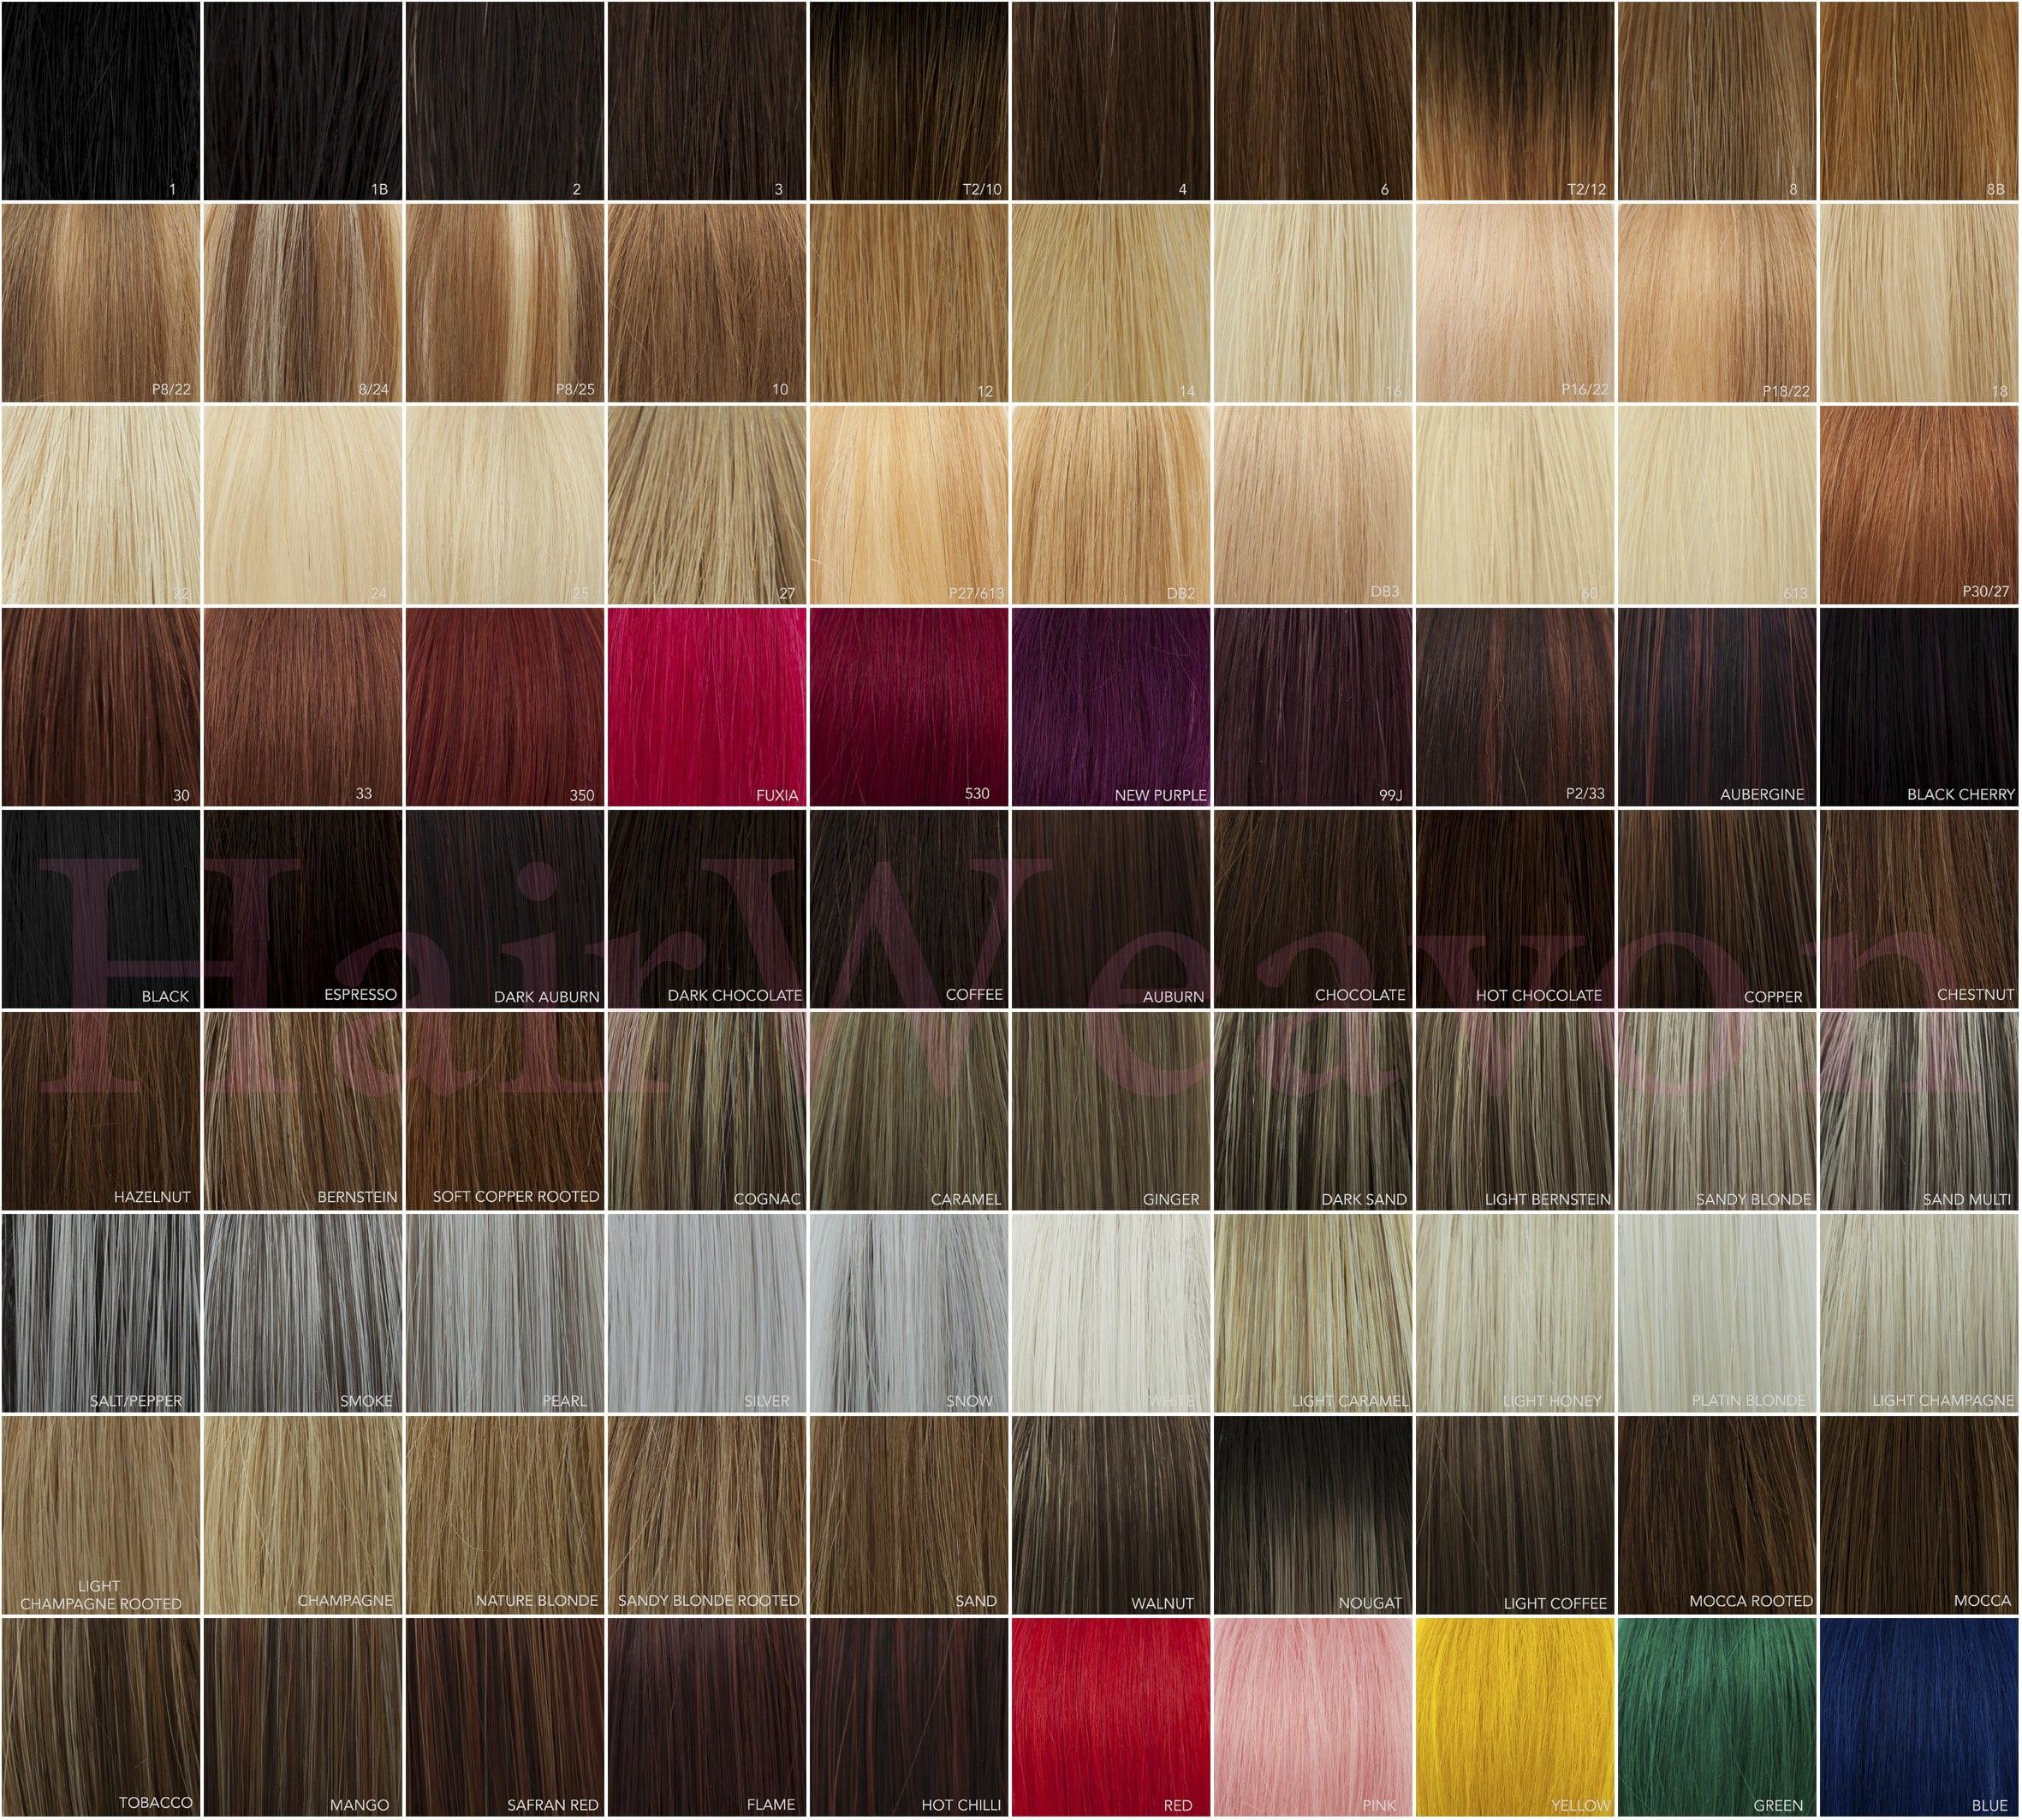 HairWeavon colour chart